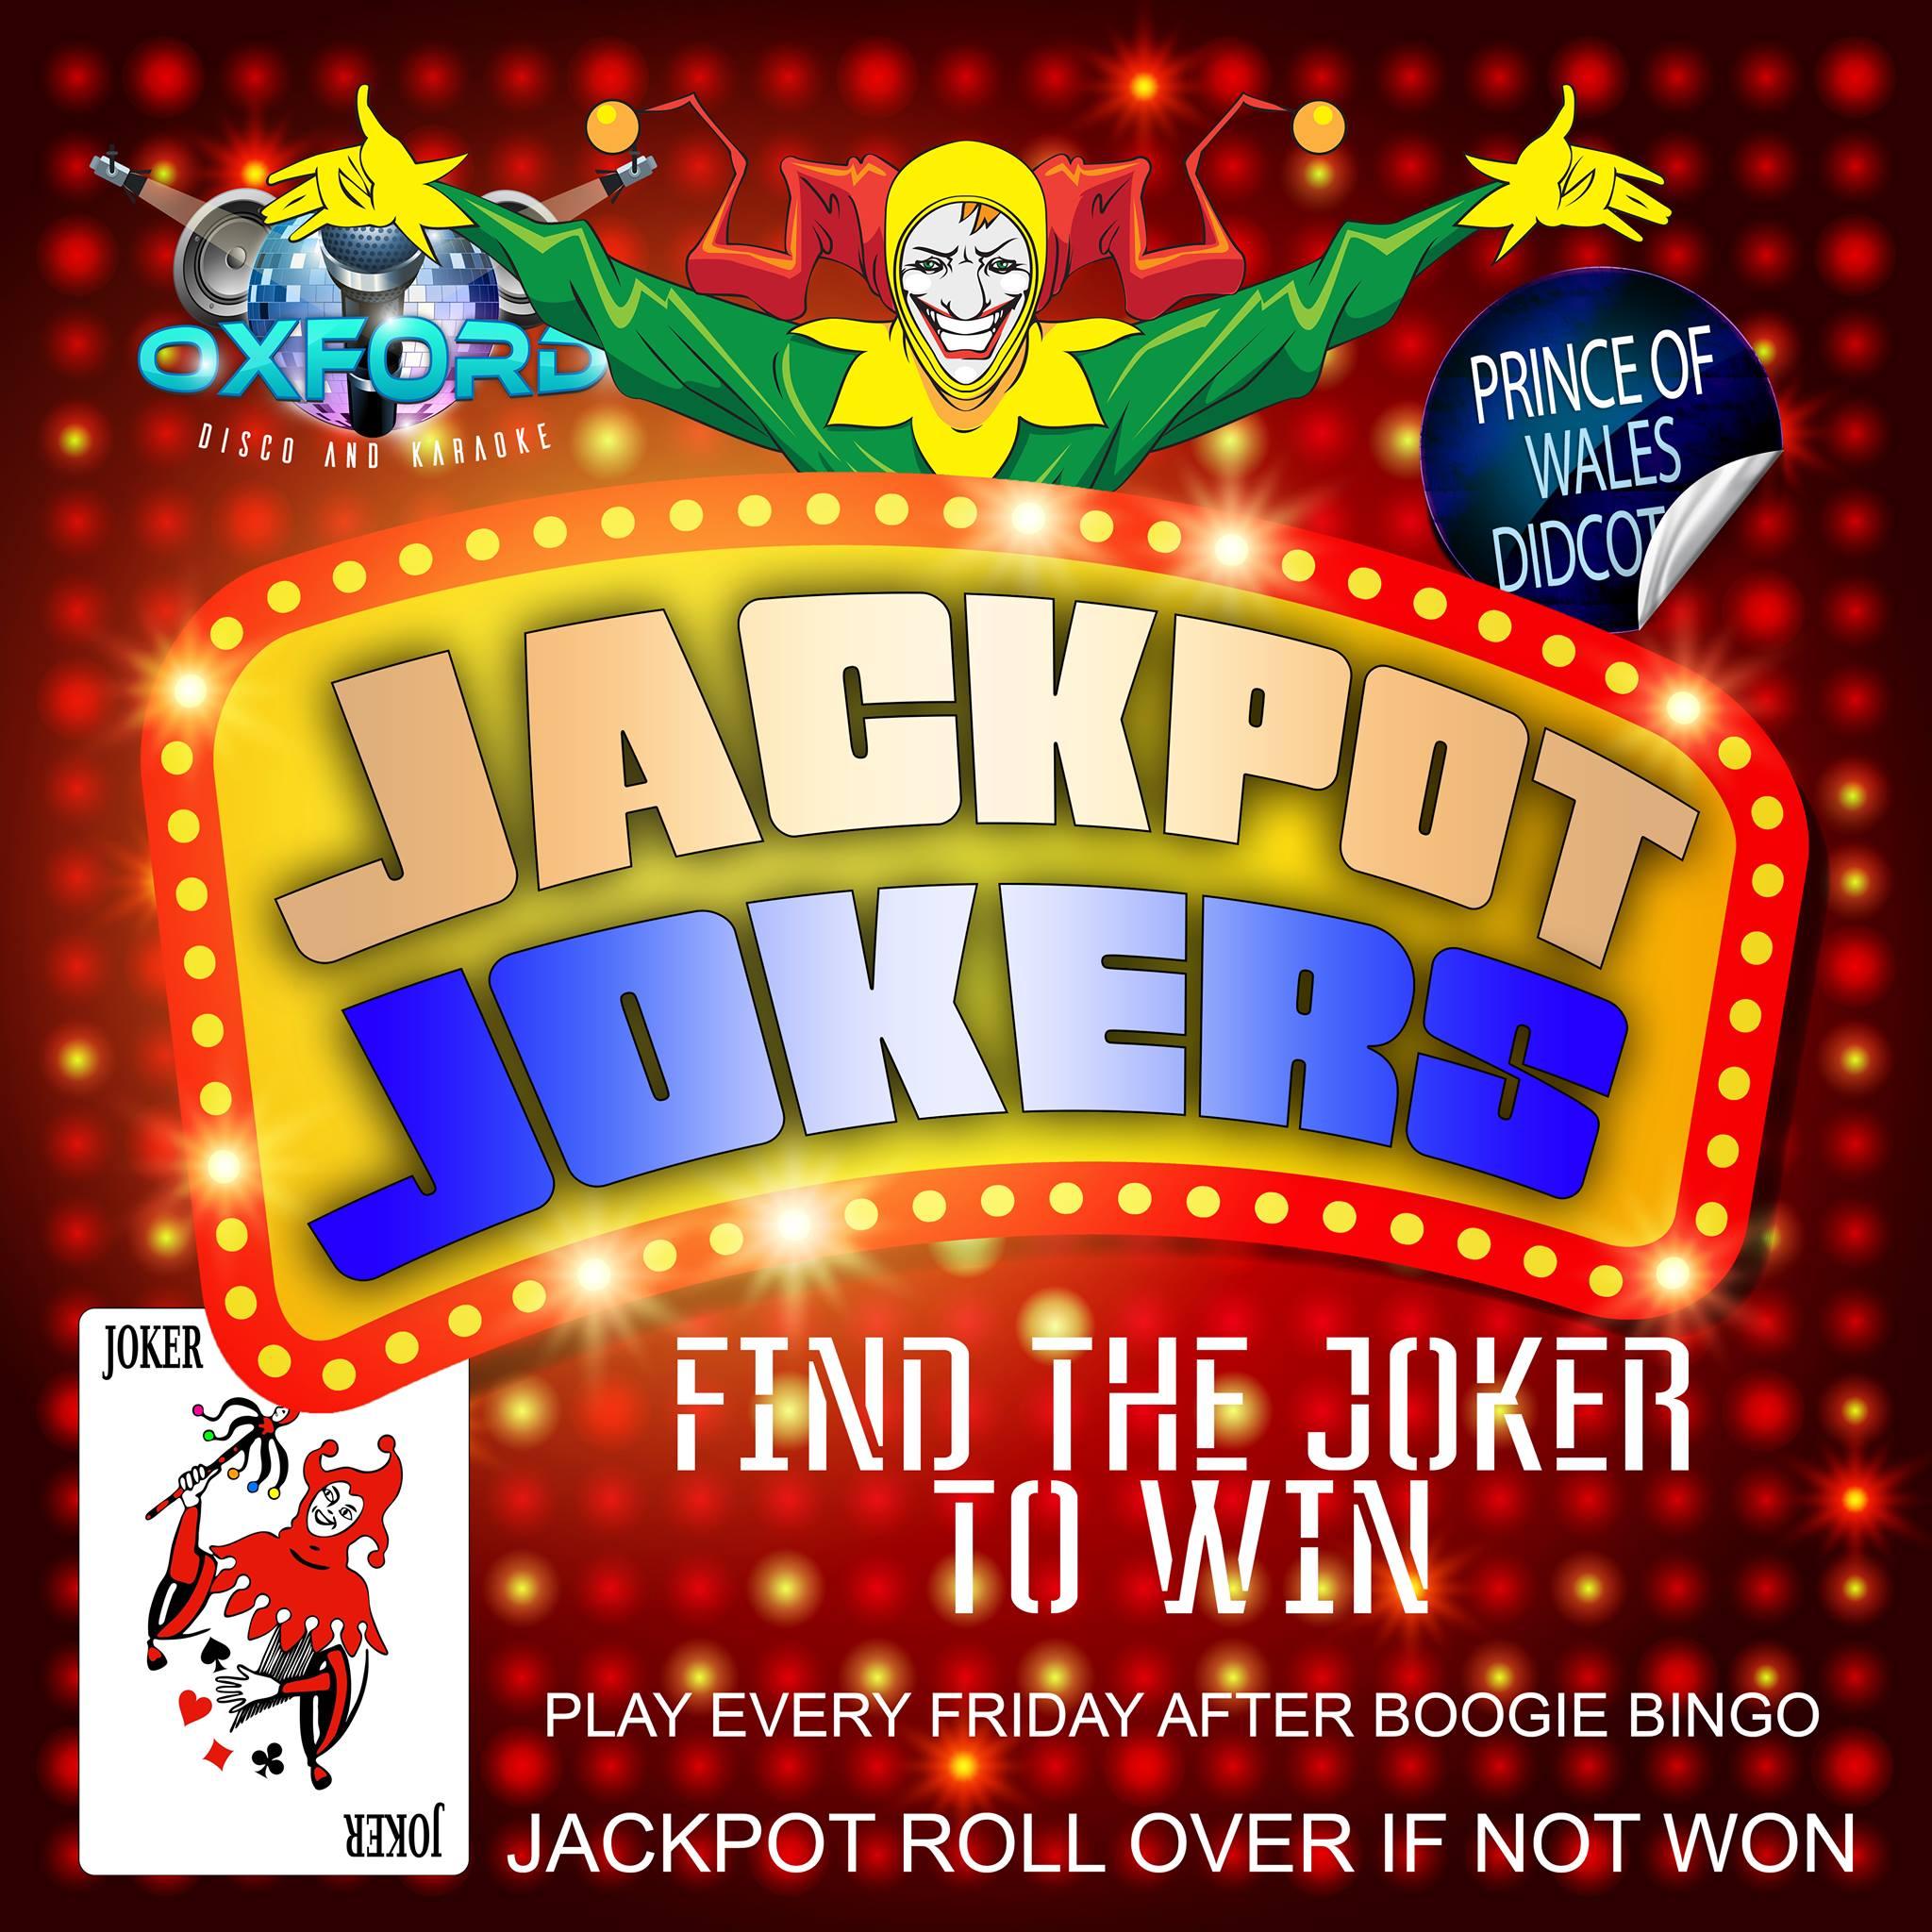 Oxford Disco and Karaoke in Oxfordshire - Boogie Music Bingo Side Game Jackpot Jokers